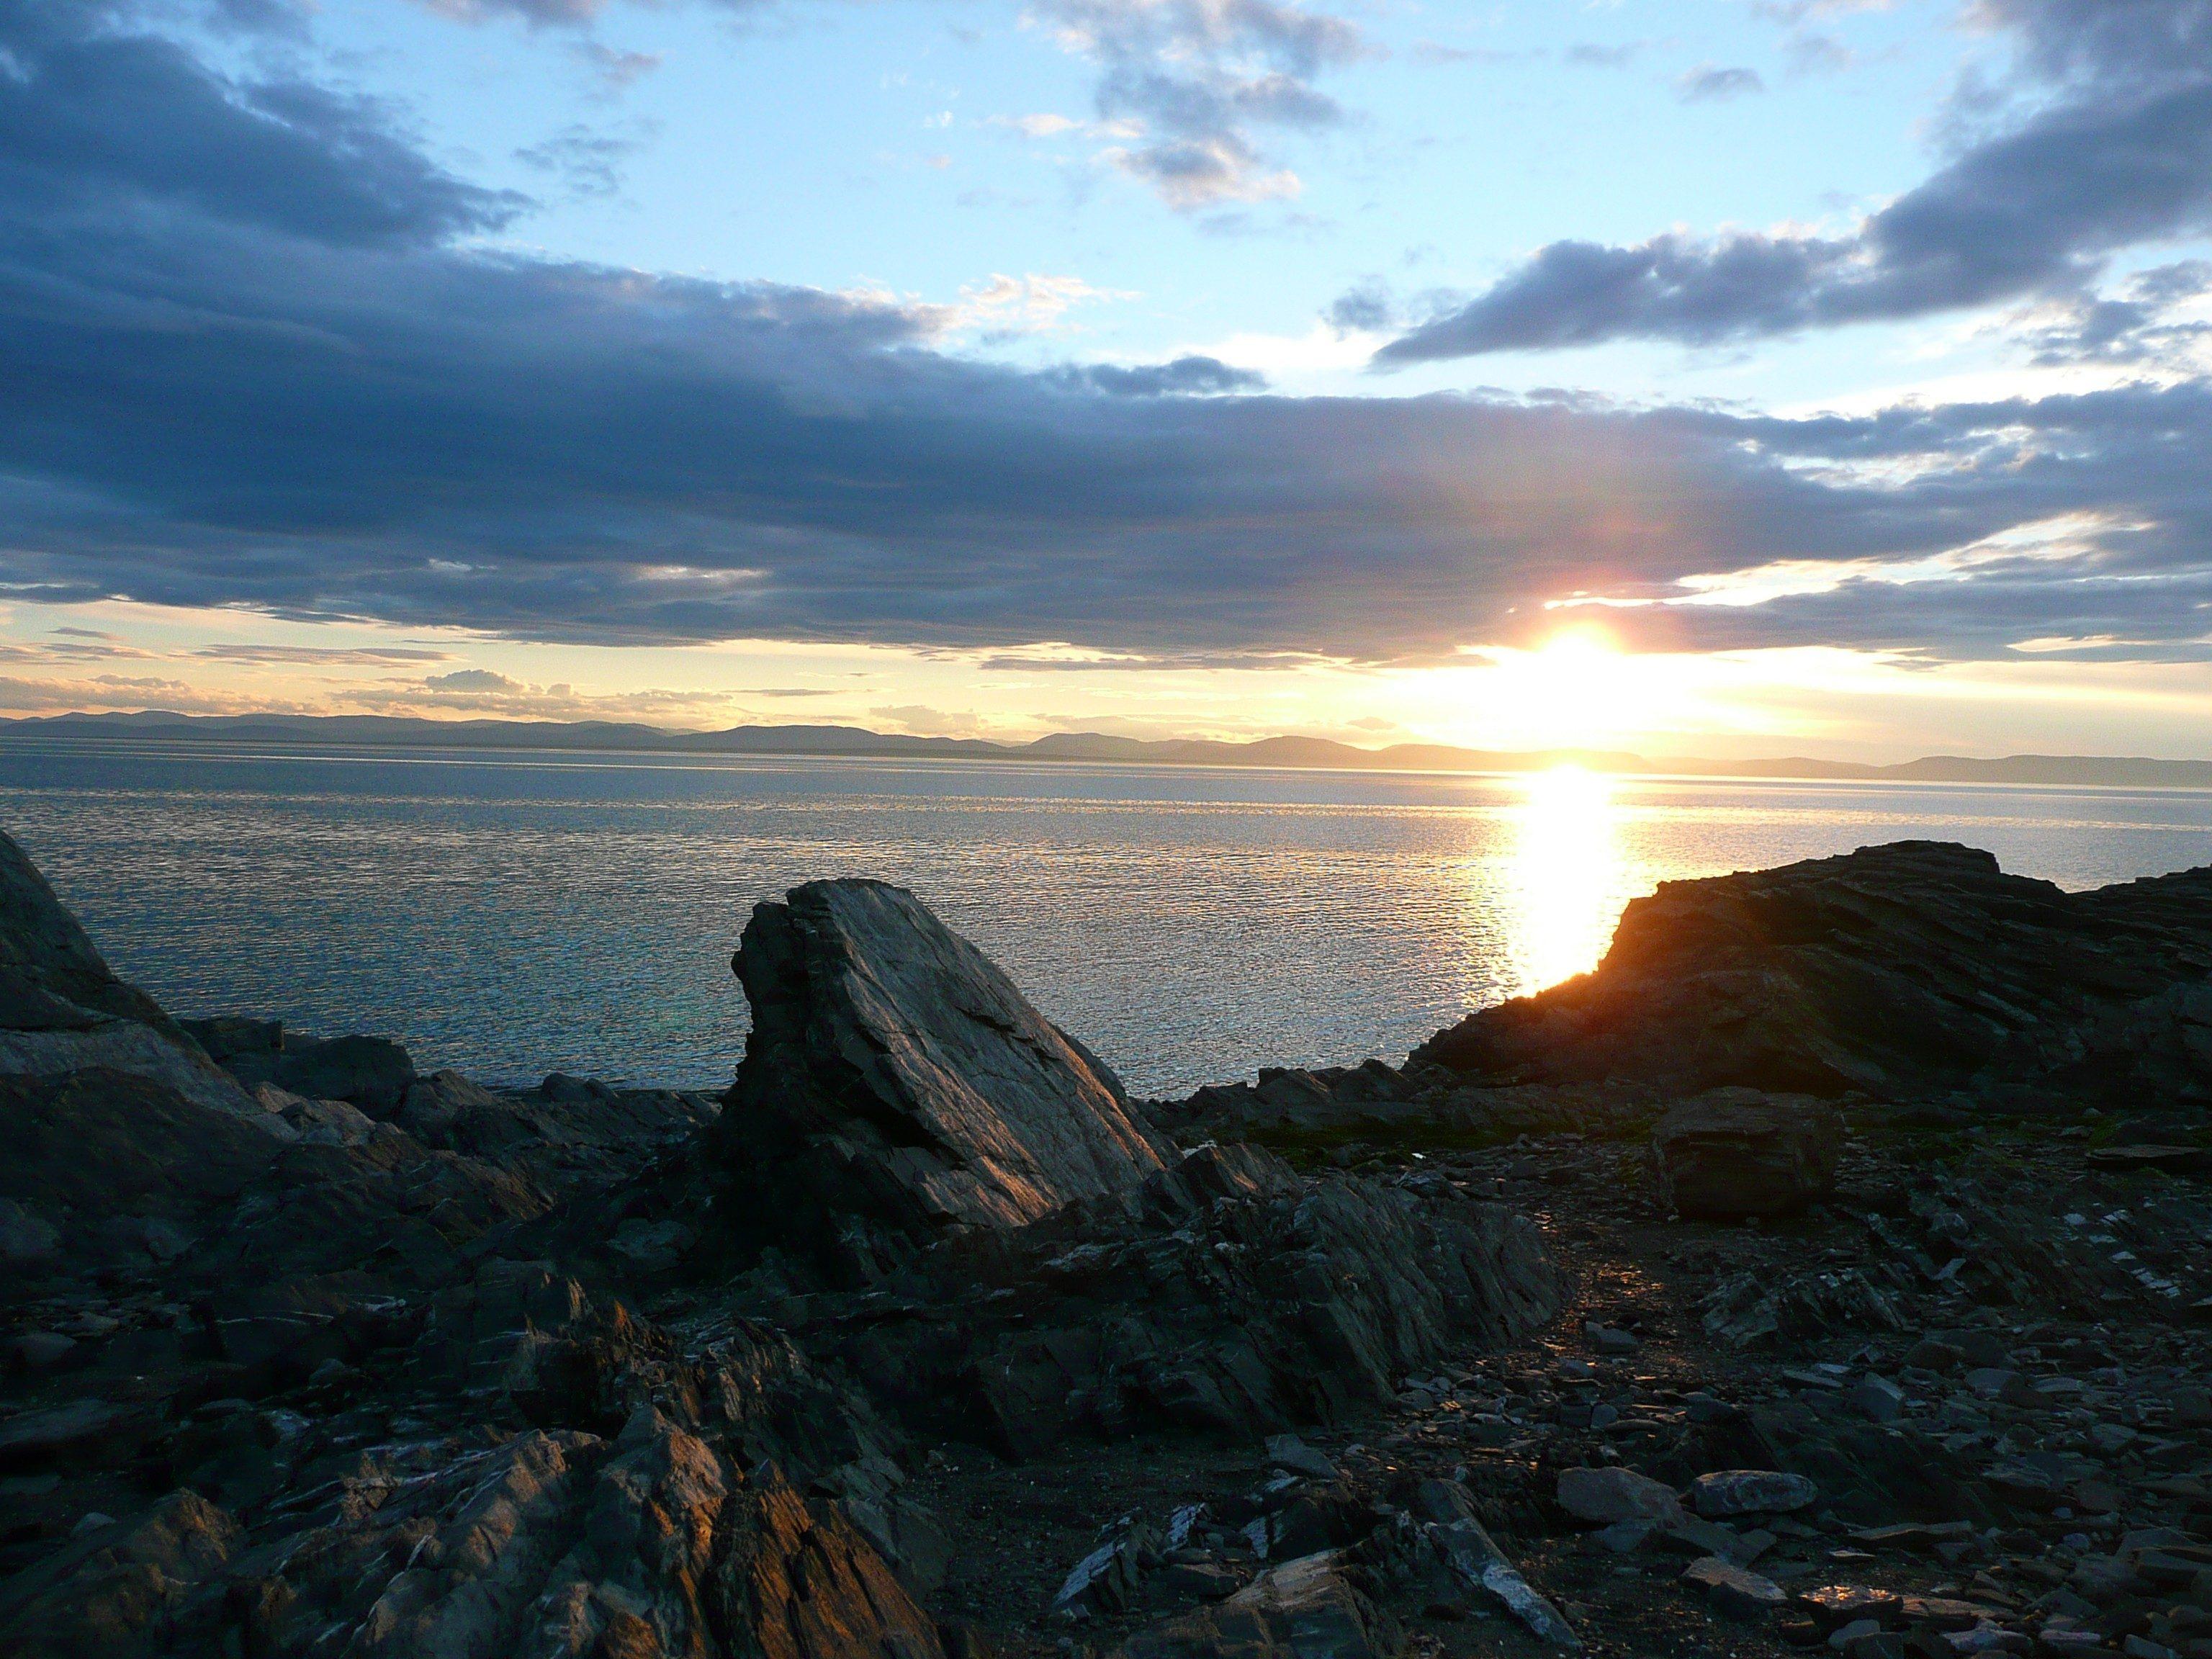 5. Glorious Sunset